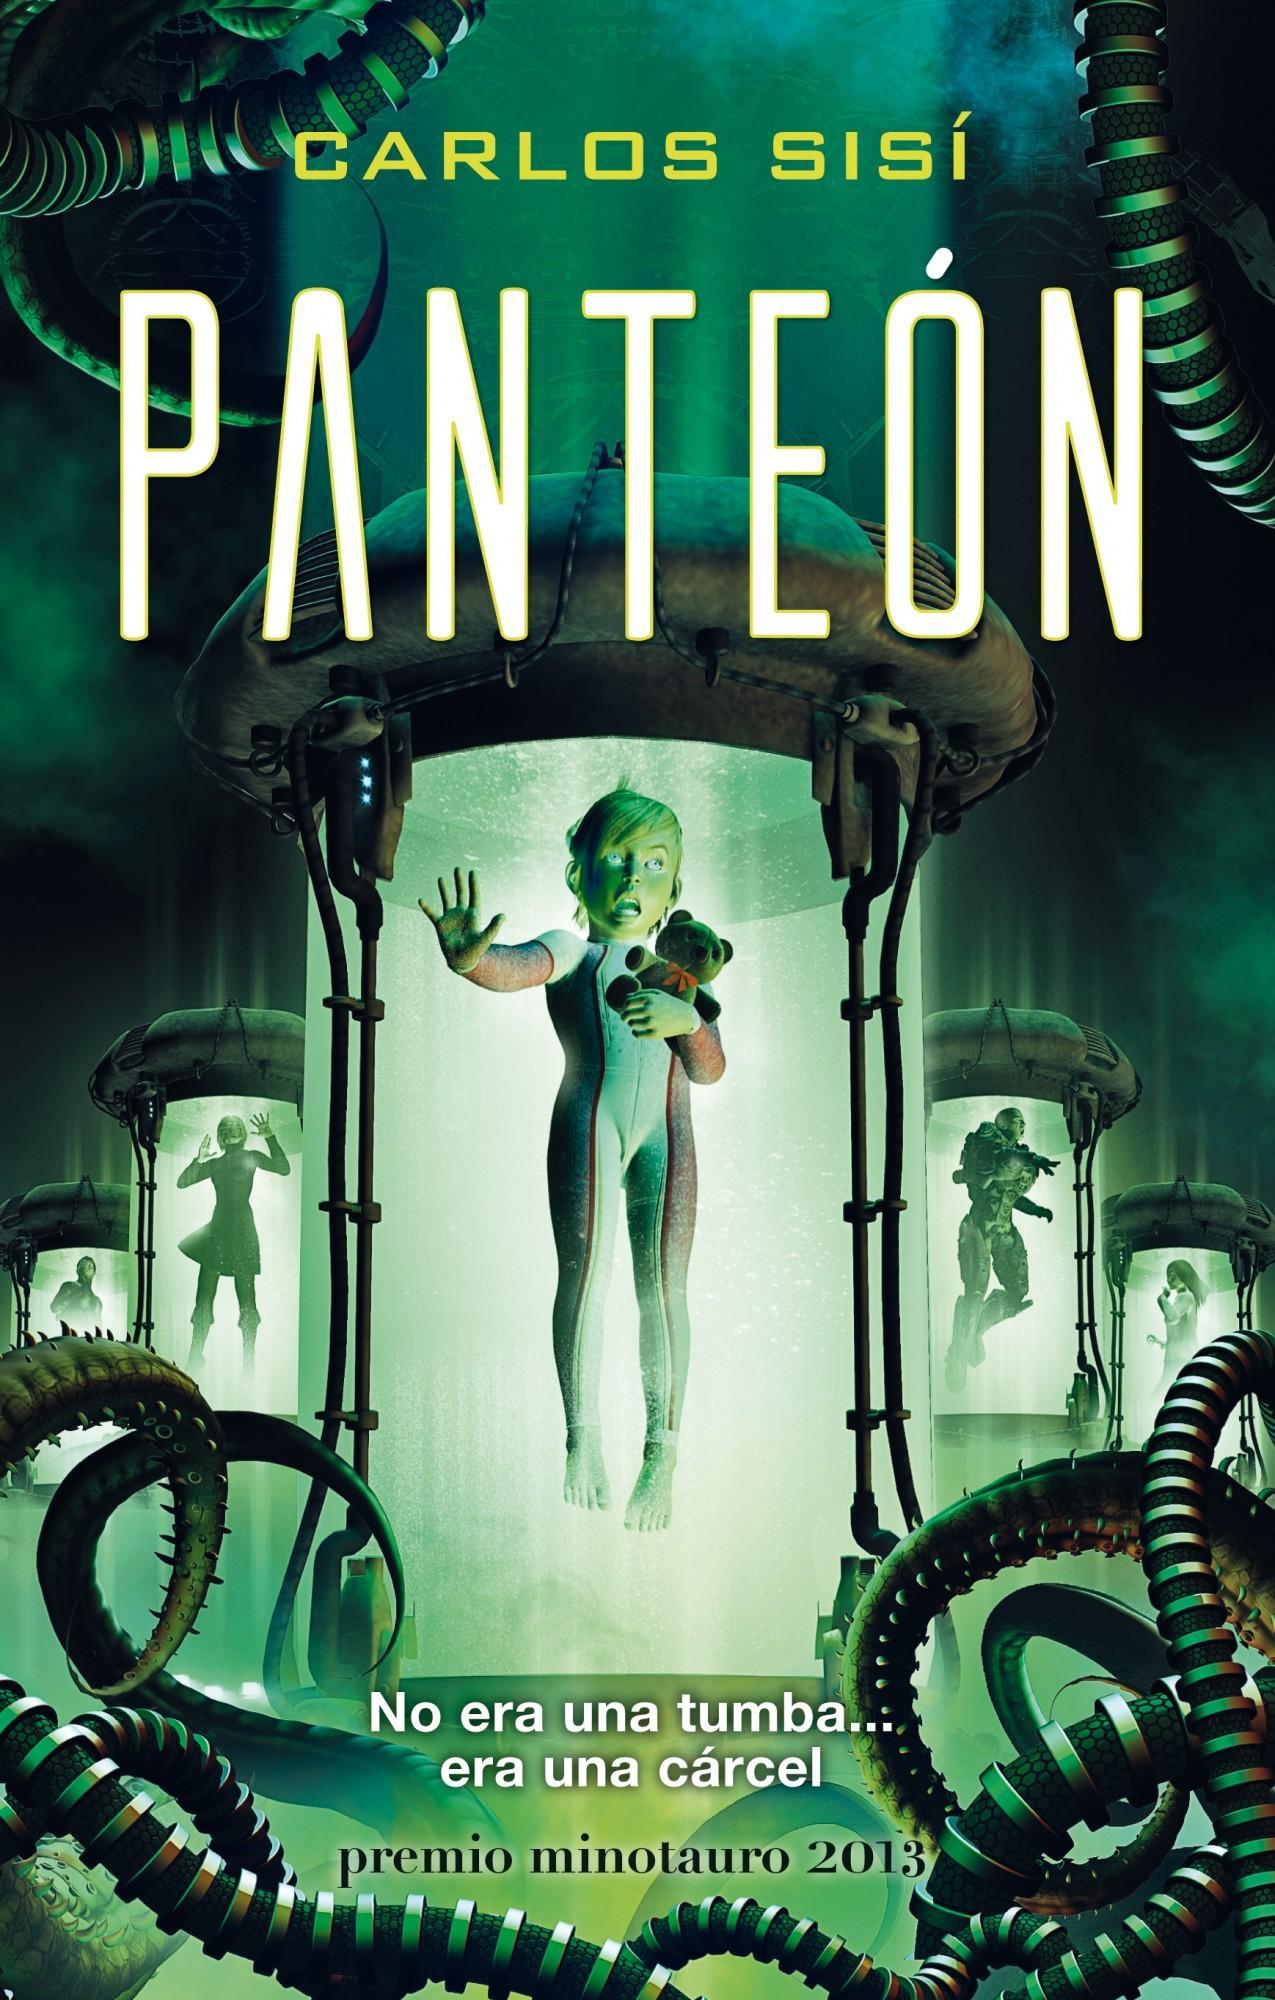 libro-panteon-carlos-sisi